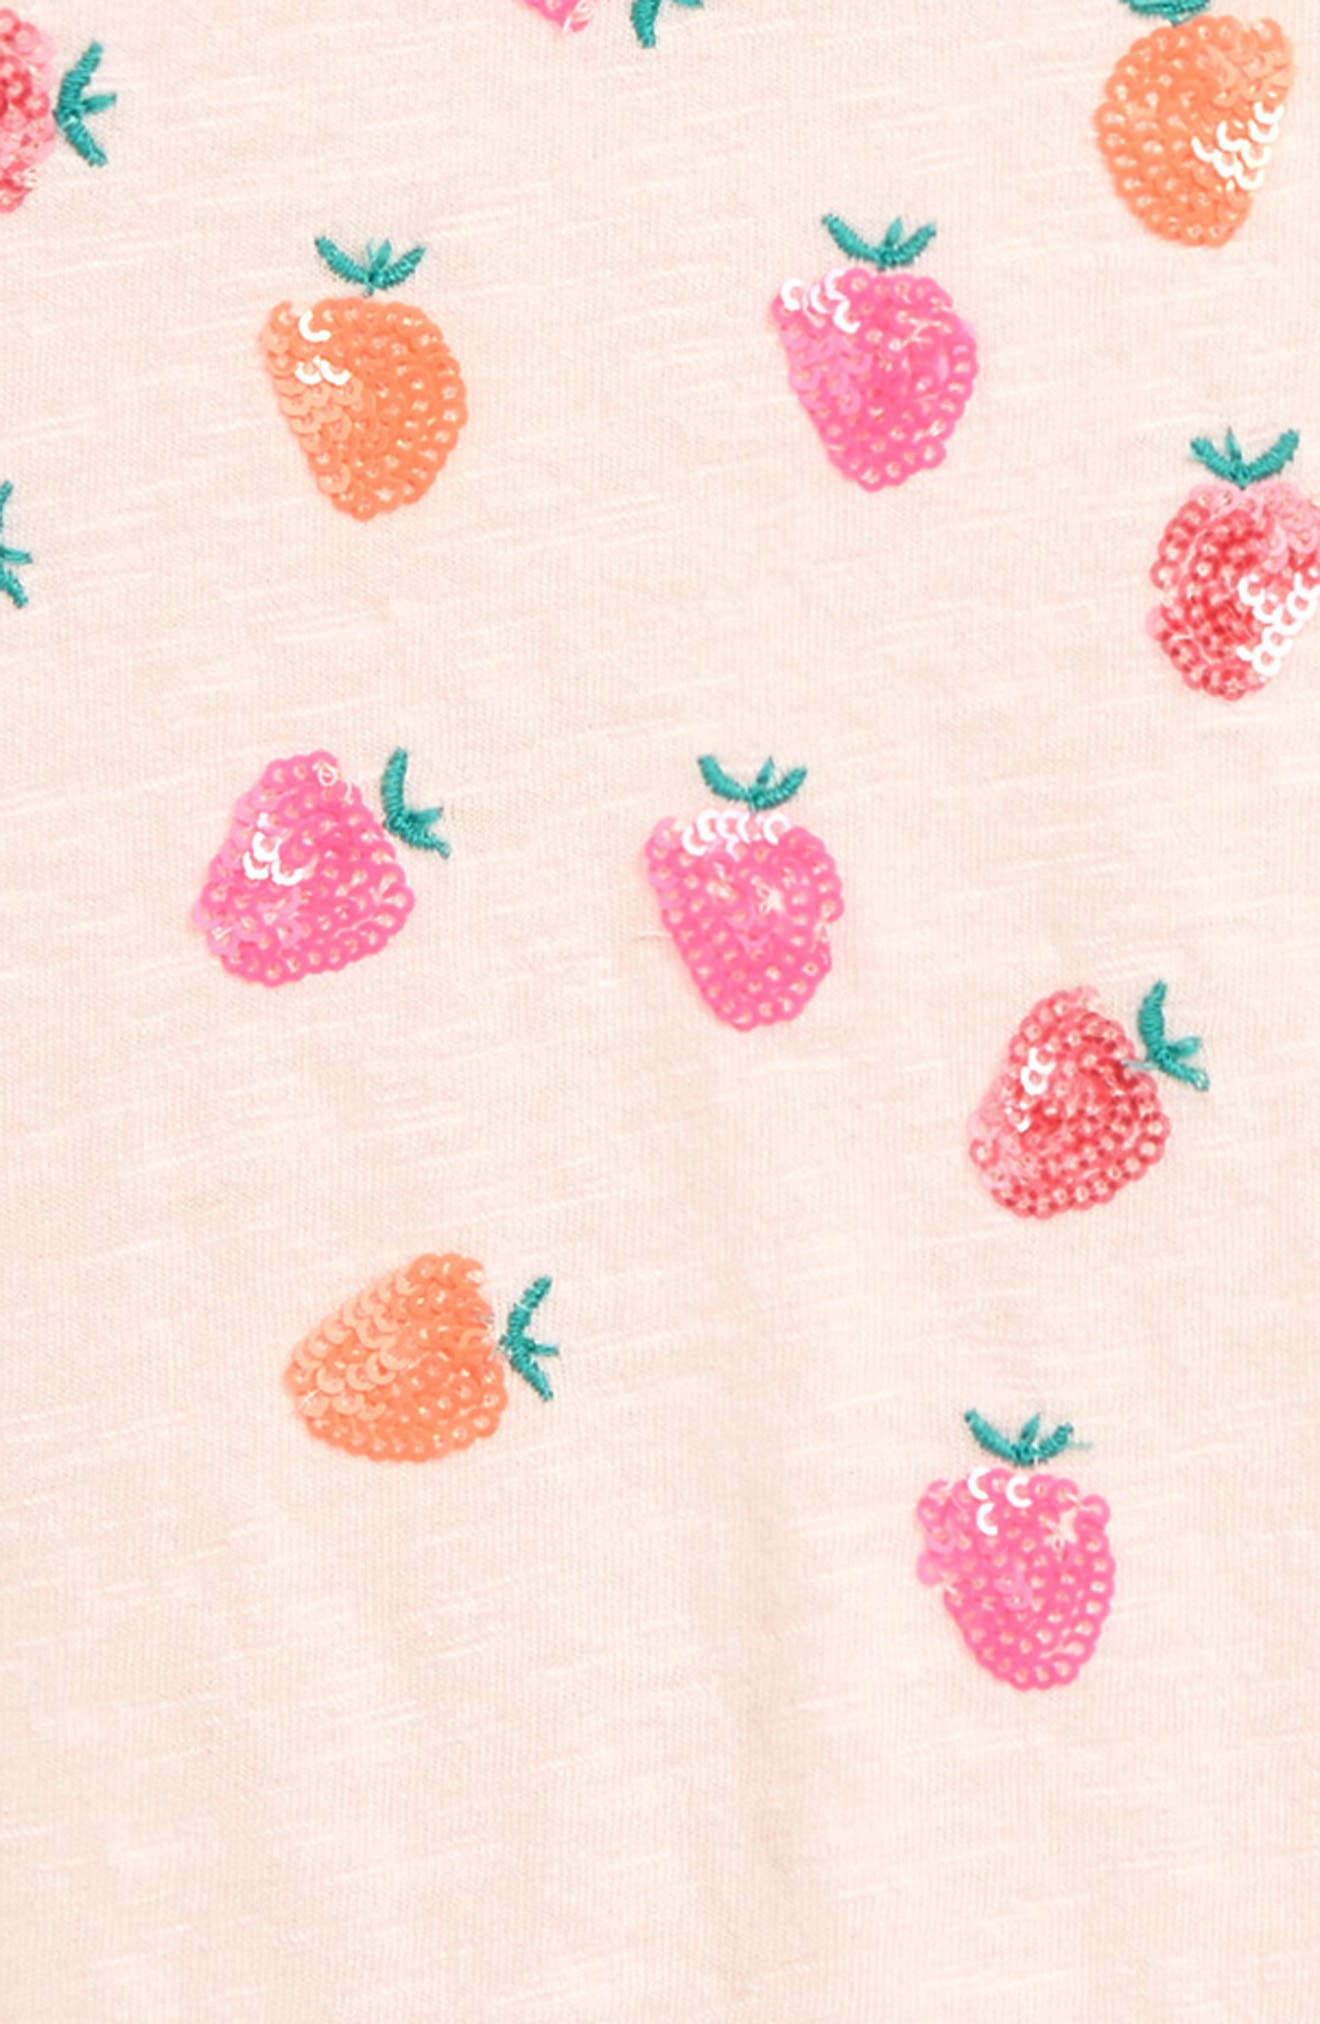 MINI BODEN, Boden Scattered Sequin Star Tee, Alternate thumbnail 2, color, PNK PARISIAN PINK STRAWBERRIES